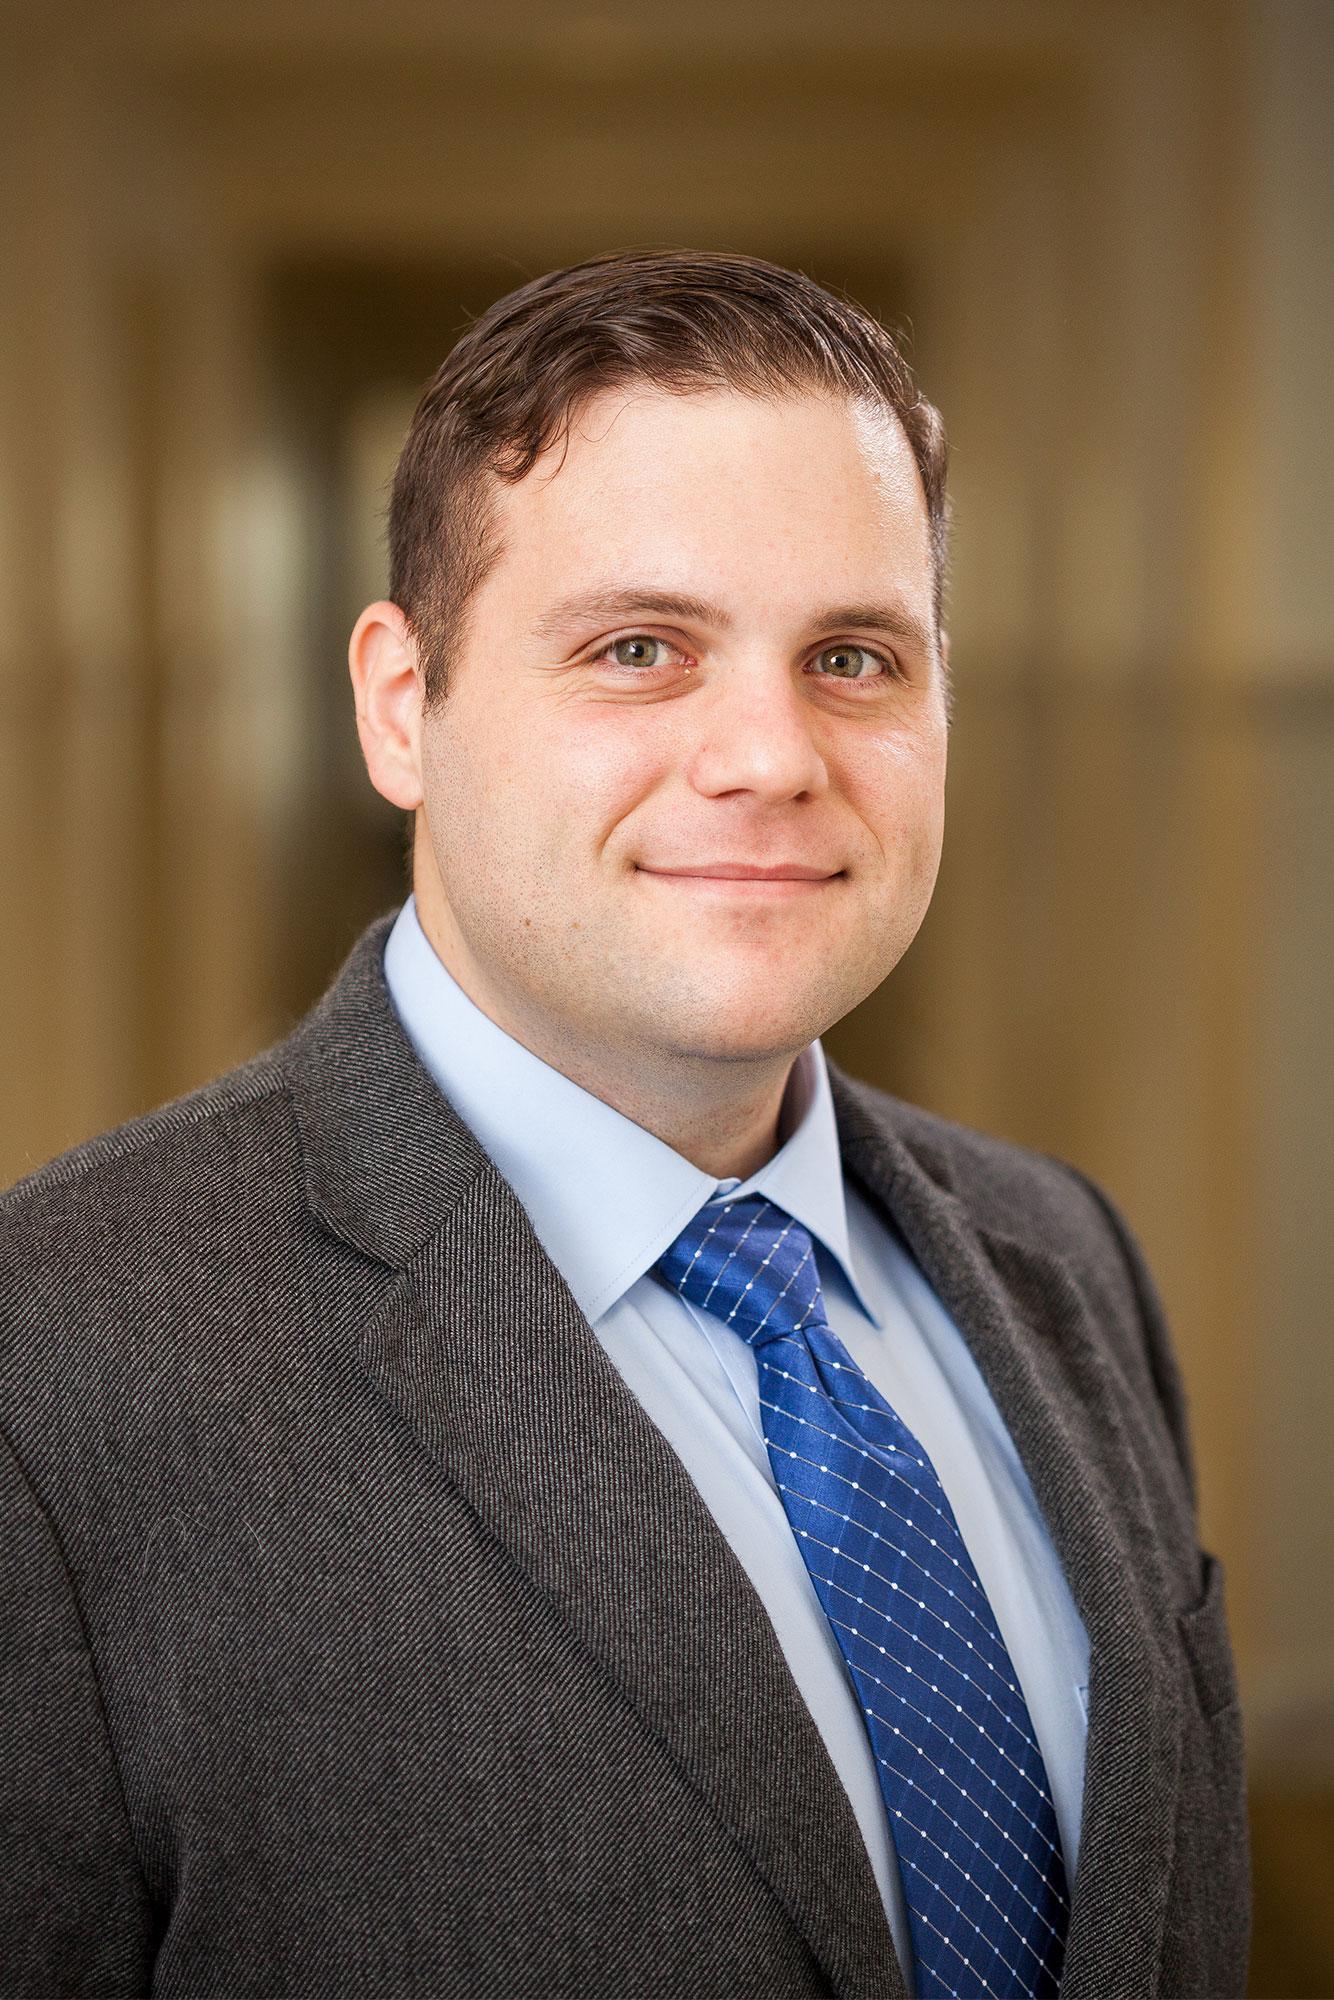 Portrait of David Fadden Commercial Web Services Client Advocate Manager